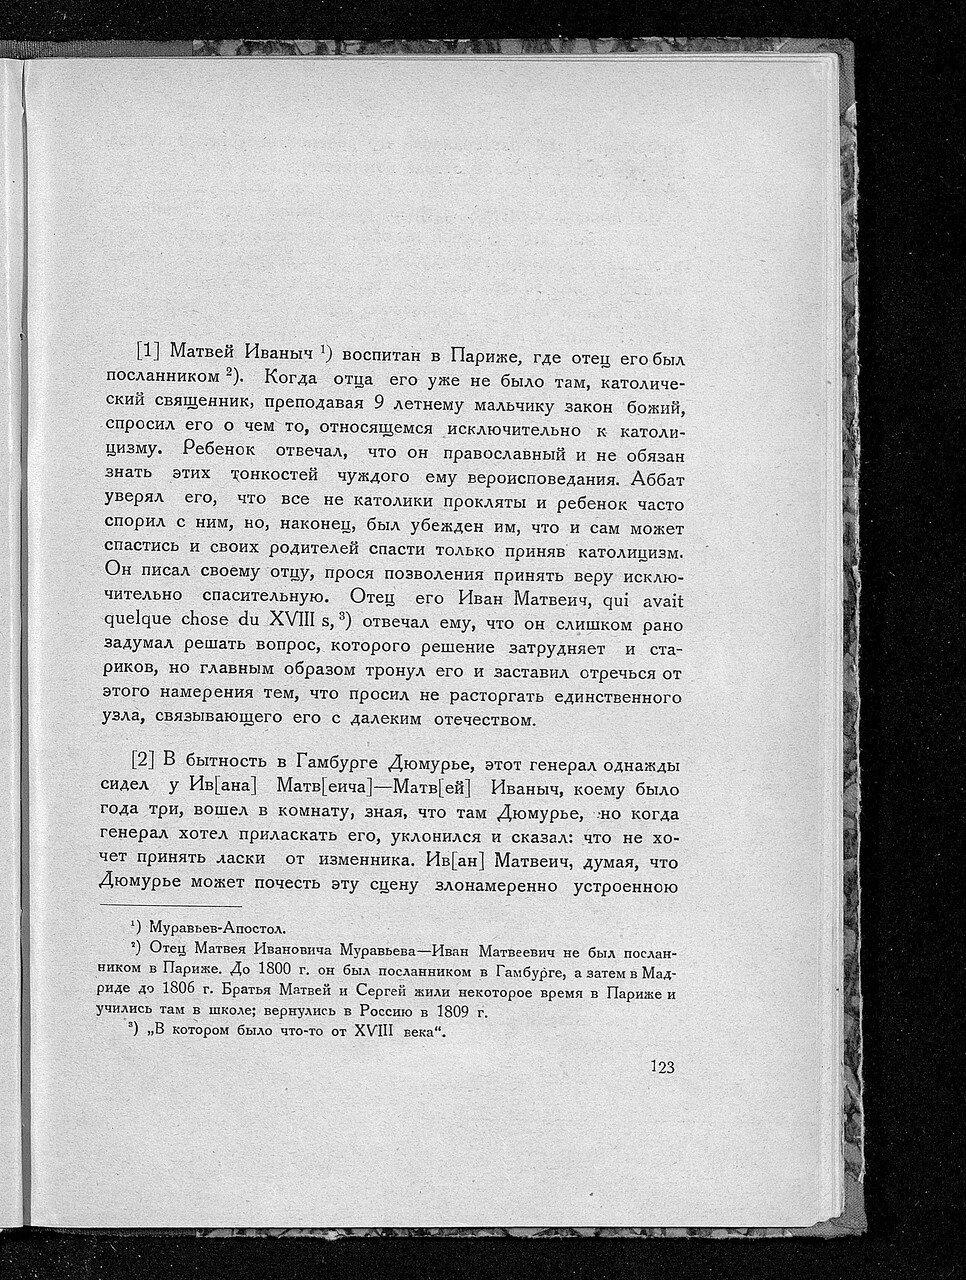 https://img-fotki.yandex.ru/get/879536/199368979.a2/0_214375_6f6caee4_XXXL.jpg